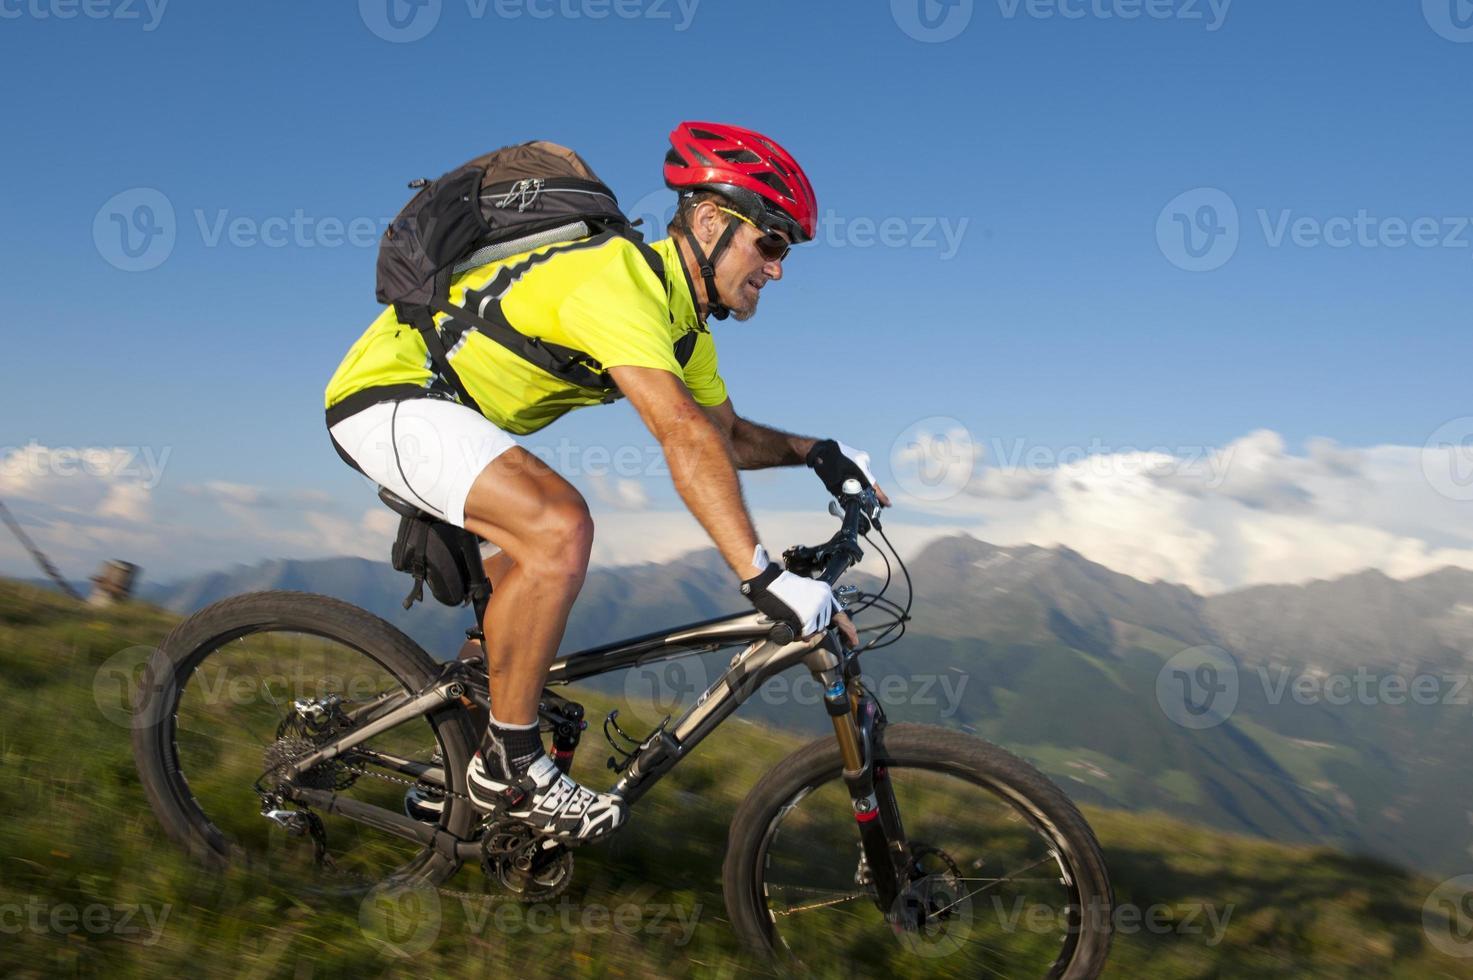 bicicleta de montanha turva ladeira abaixo foto